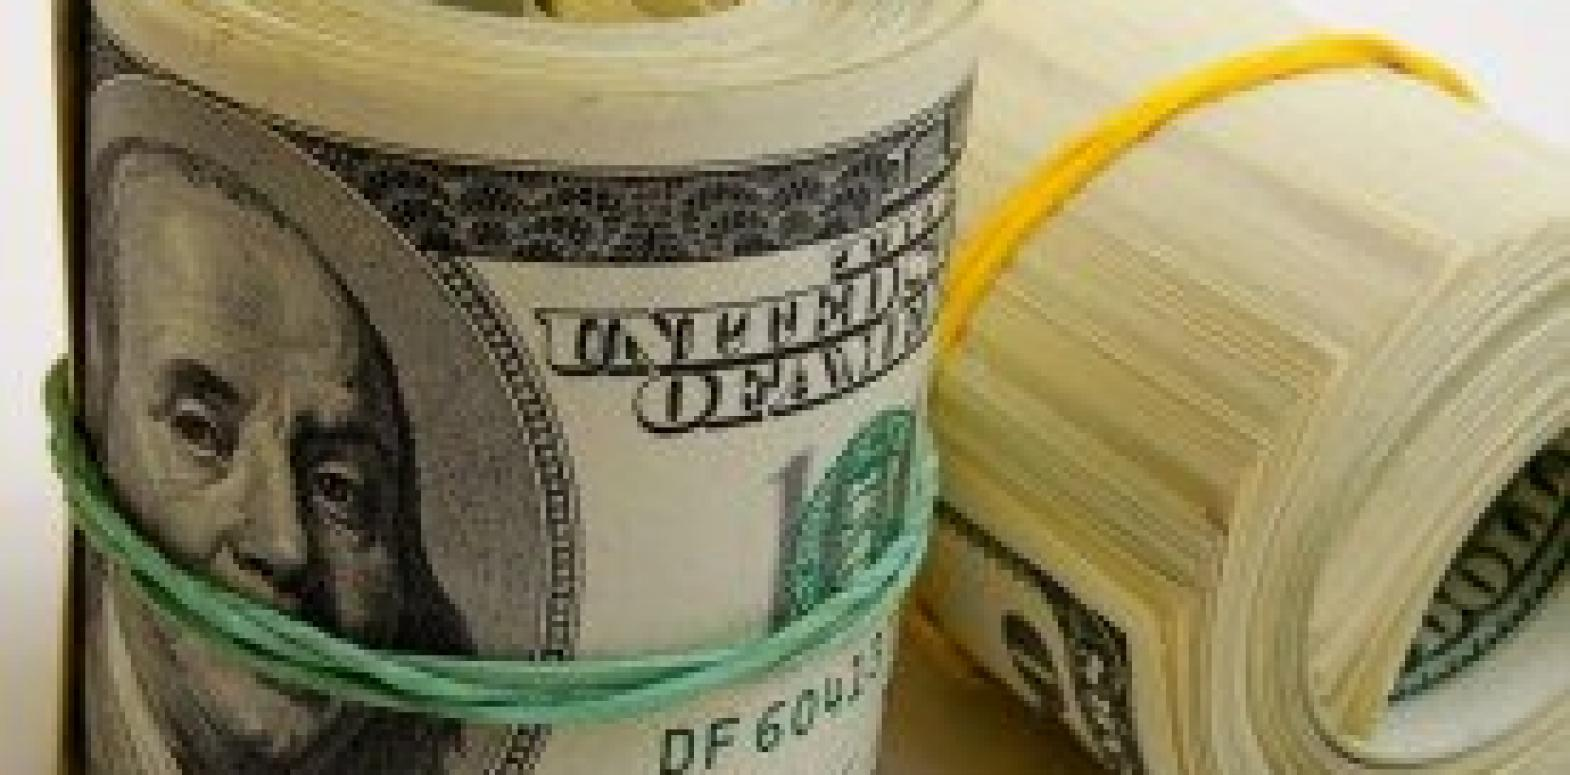 Наличный курс на 17 февраля: доллар - 24,30-24,55 грн, евро - 26,30-26,70 грн